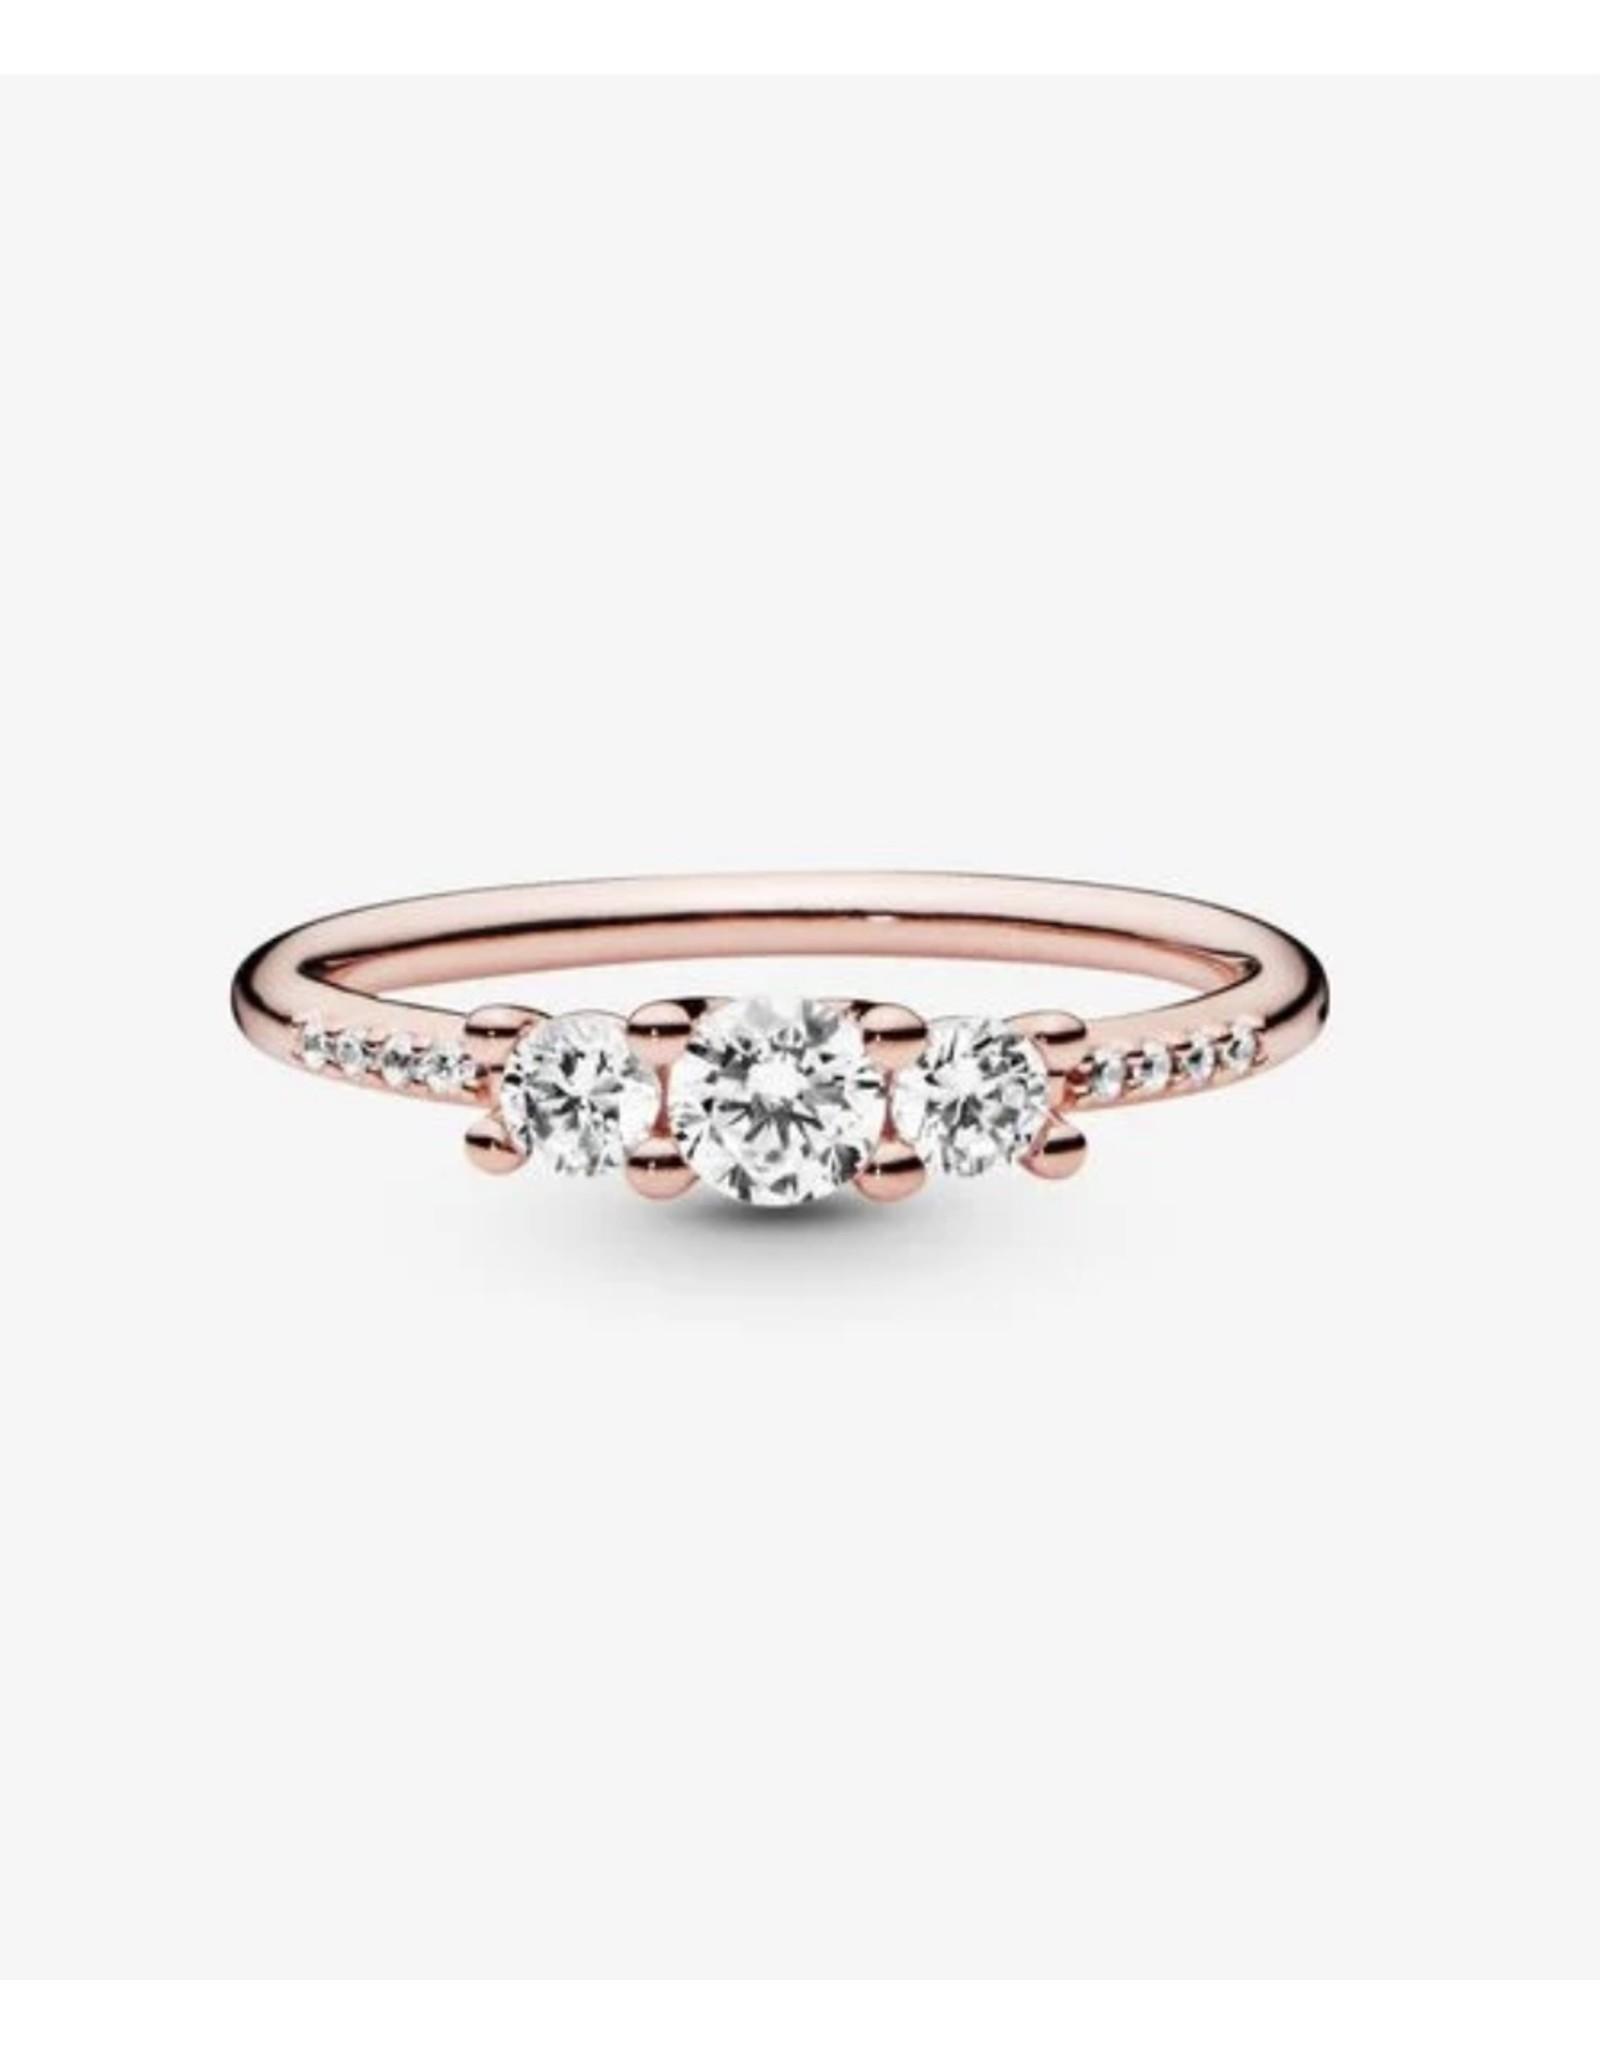 Pandora Pandora Ring,(186242CZ) Rose Gold, Sparkling, Elegance, Clear CZ